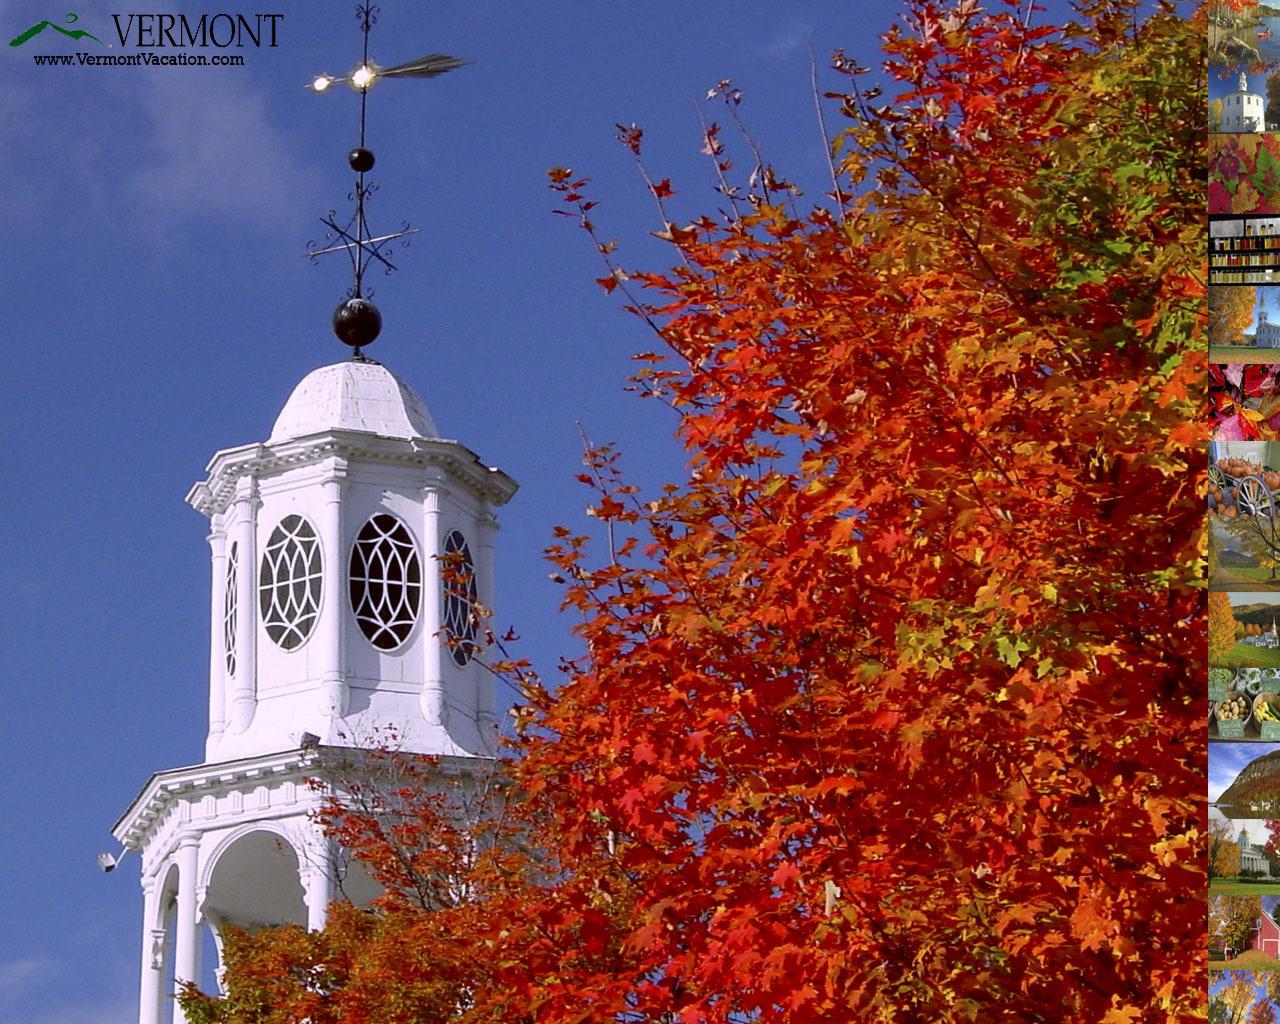 Vermont Autumn Background Wallpaper - WallpaperSafari